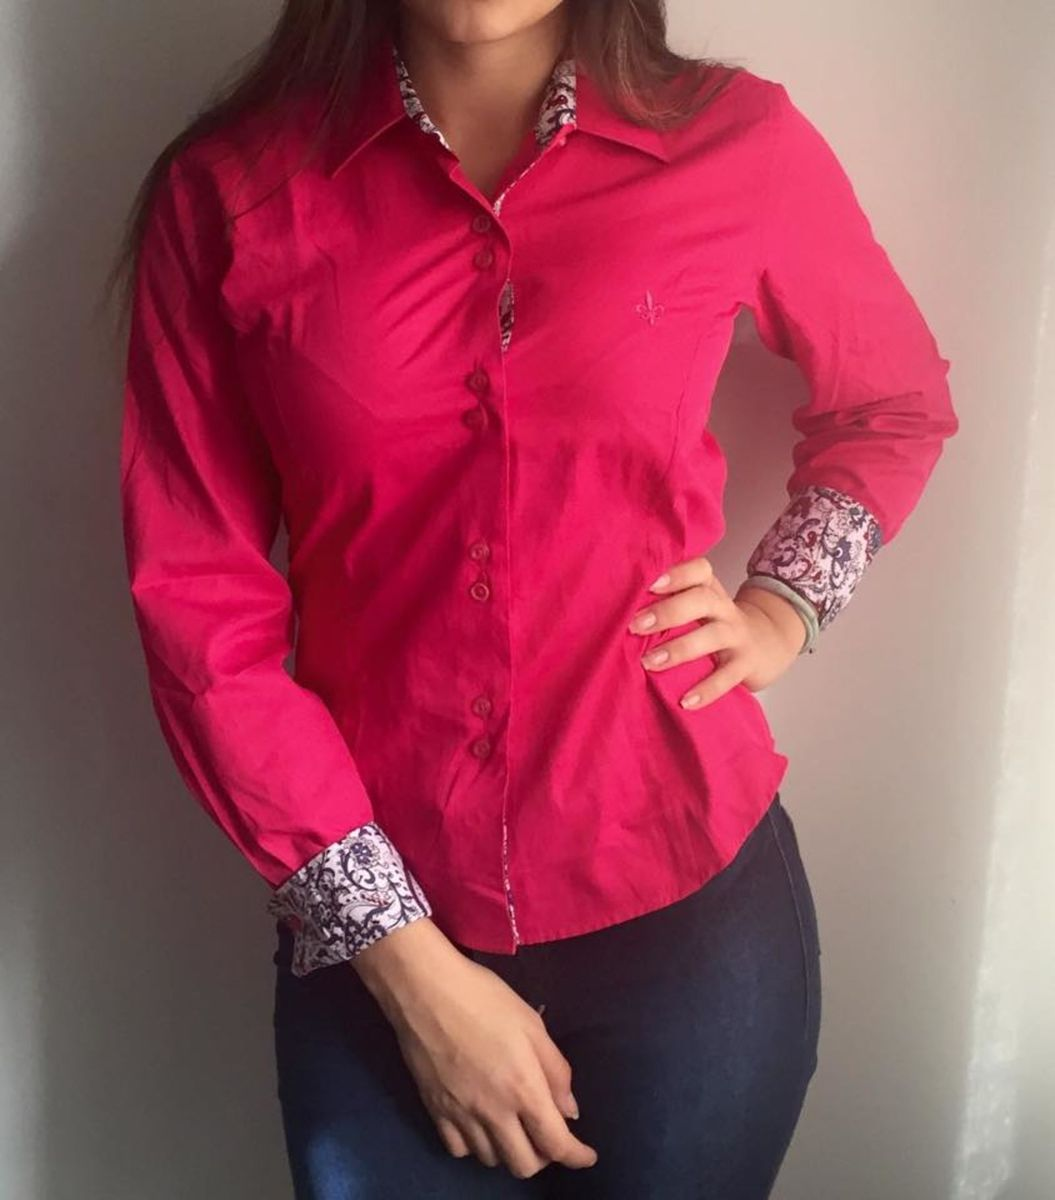 camisa social feminina dudalina - camisas dudalina 0da3a187d5cc2